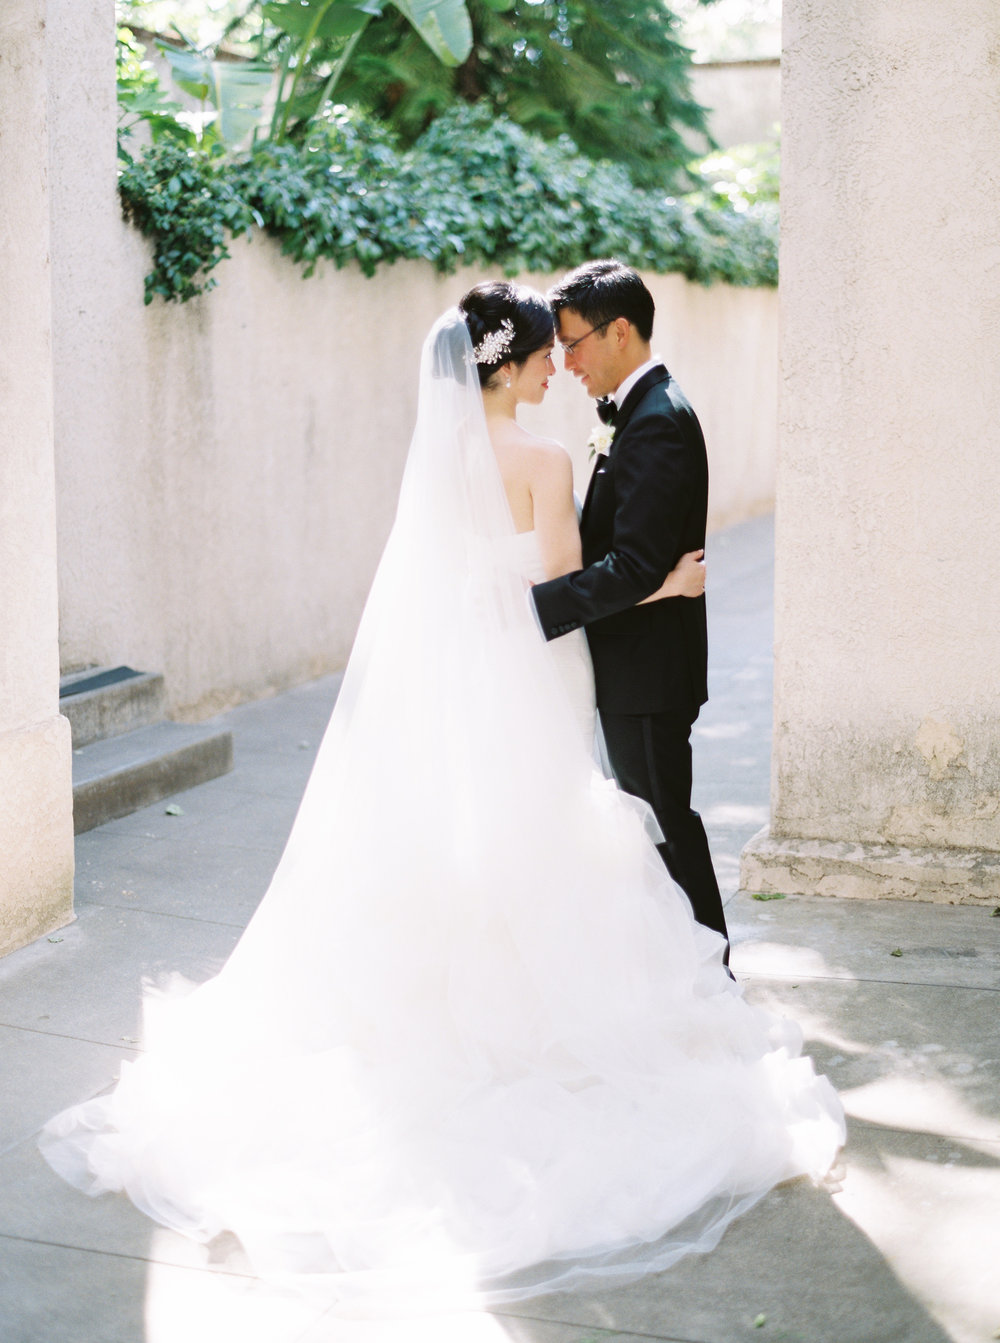 firehouse-restaurant-wedding-in-downtown-sacramento-california-130.jpg